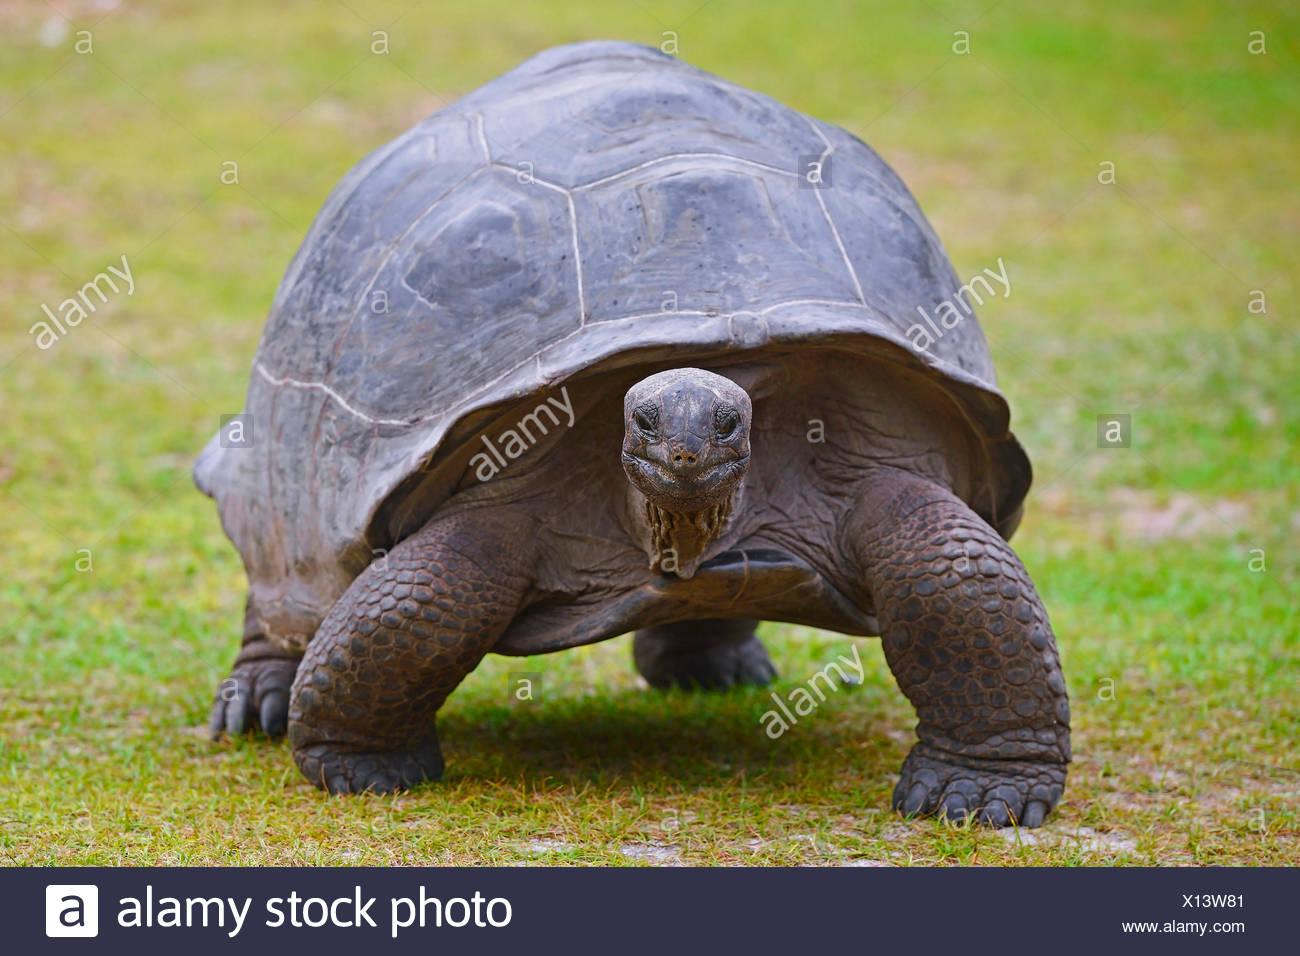 Seychelles giant tortoise, Aldabran giant tortoise, Aldabra giant tortoise (Aldabrachelys gigantea, Testudo gigantea, Geochelone gigantea, Megalochelys gigantea), walking in a meadow, front view, Seychelles, Curieuse - Stock Image